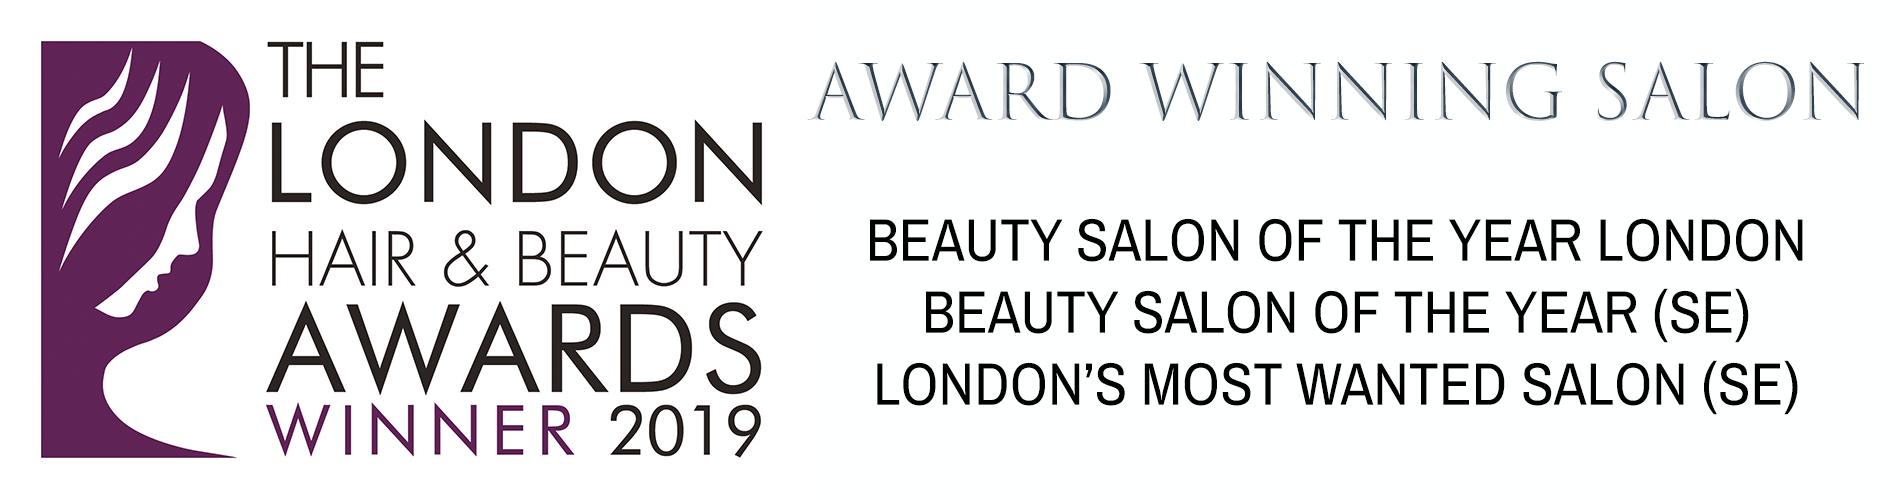 Inspire Beauty Wins 3 Top Awards